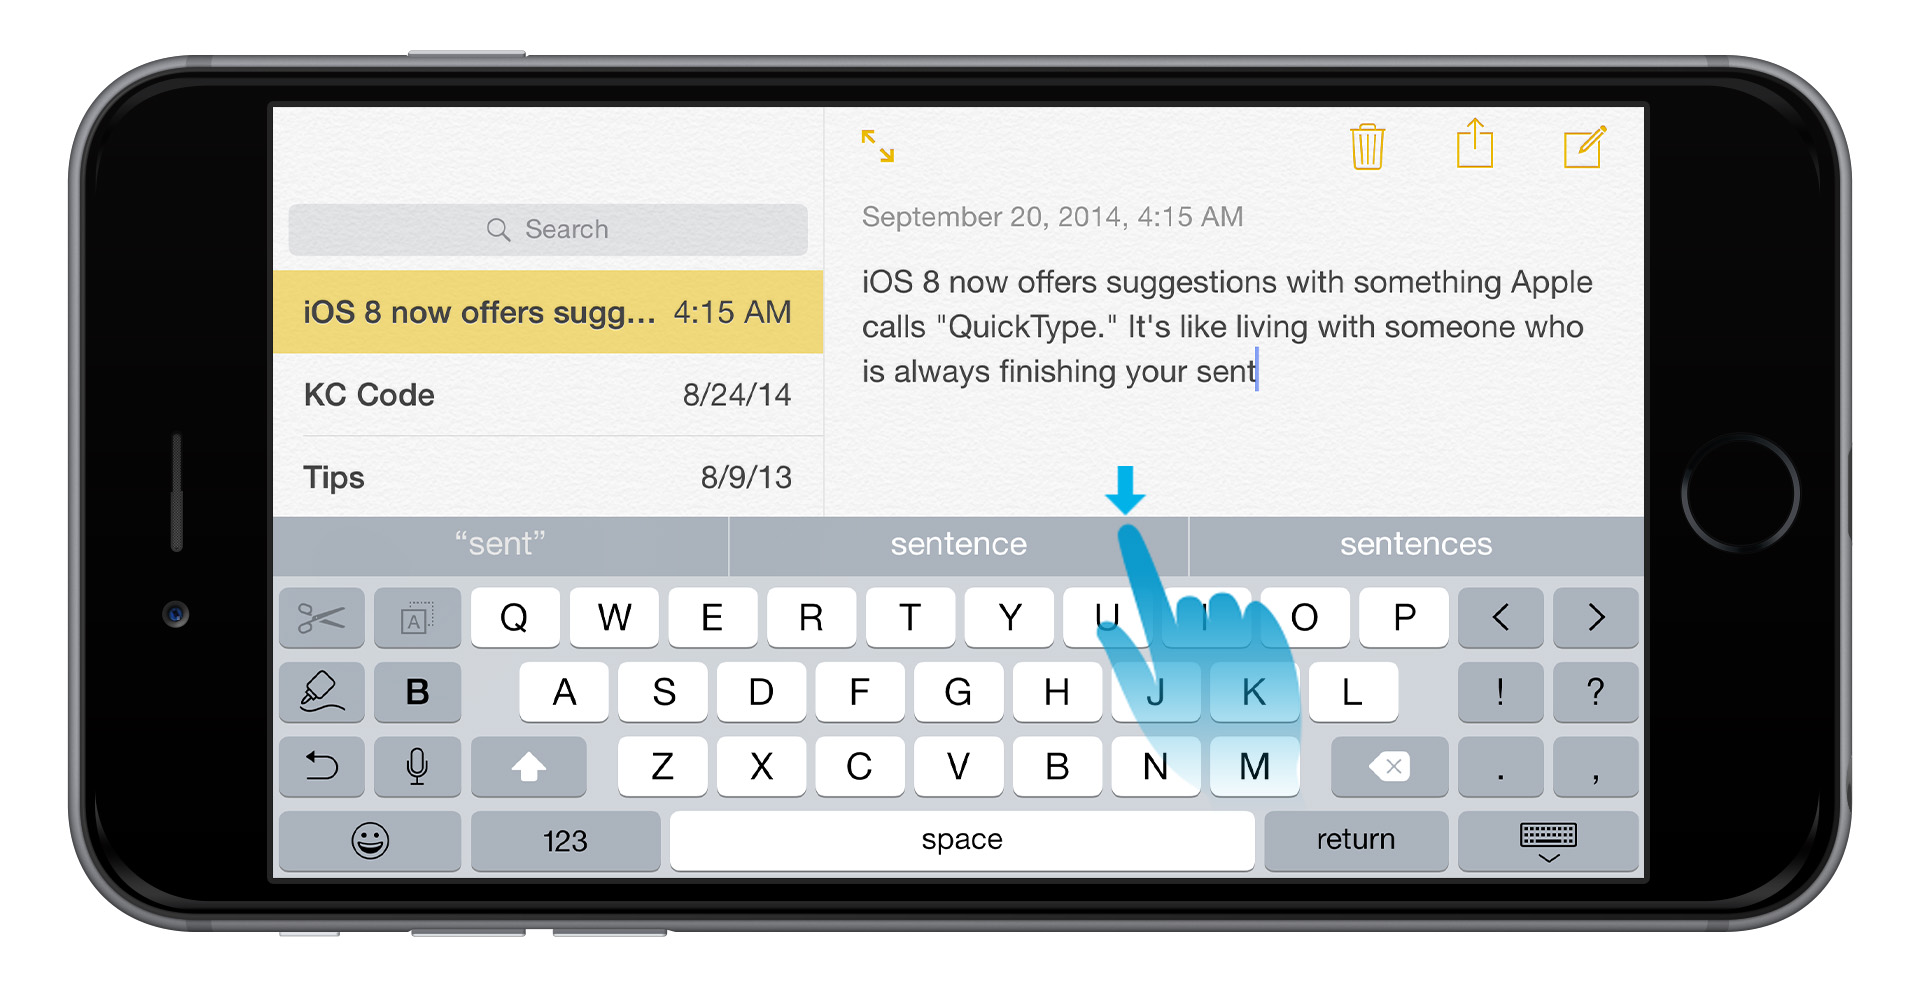 iphone 6 quicktype